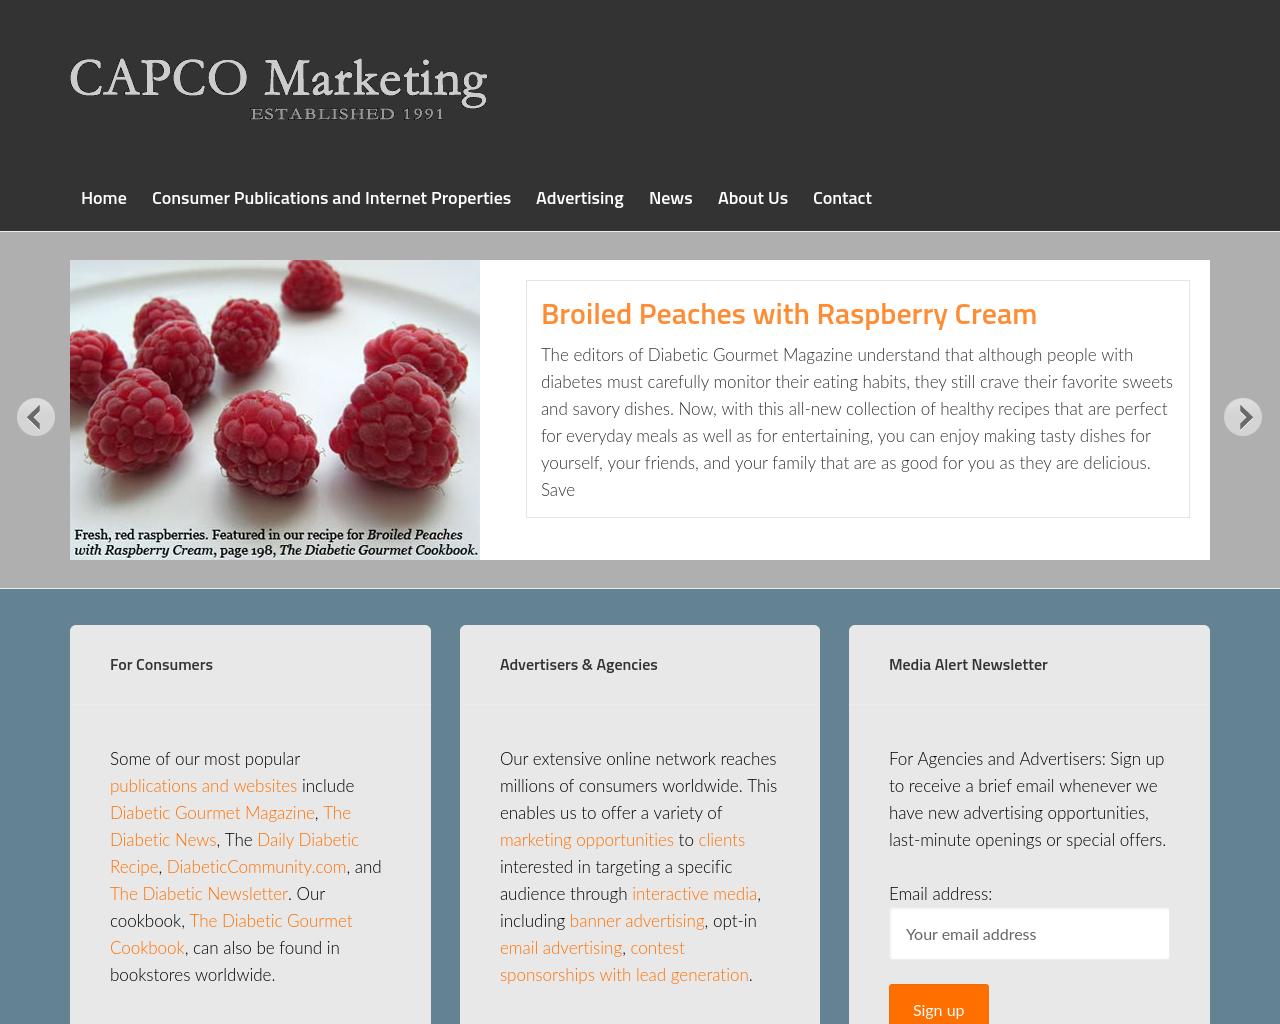 CAPCO-Marketing-Advertising-Reviews-Pricing